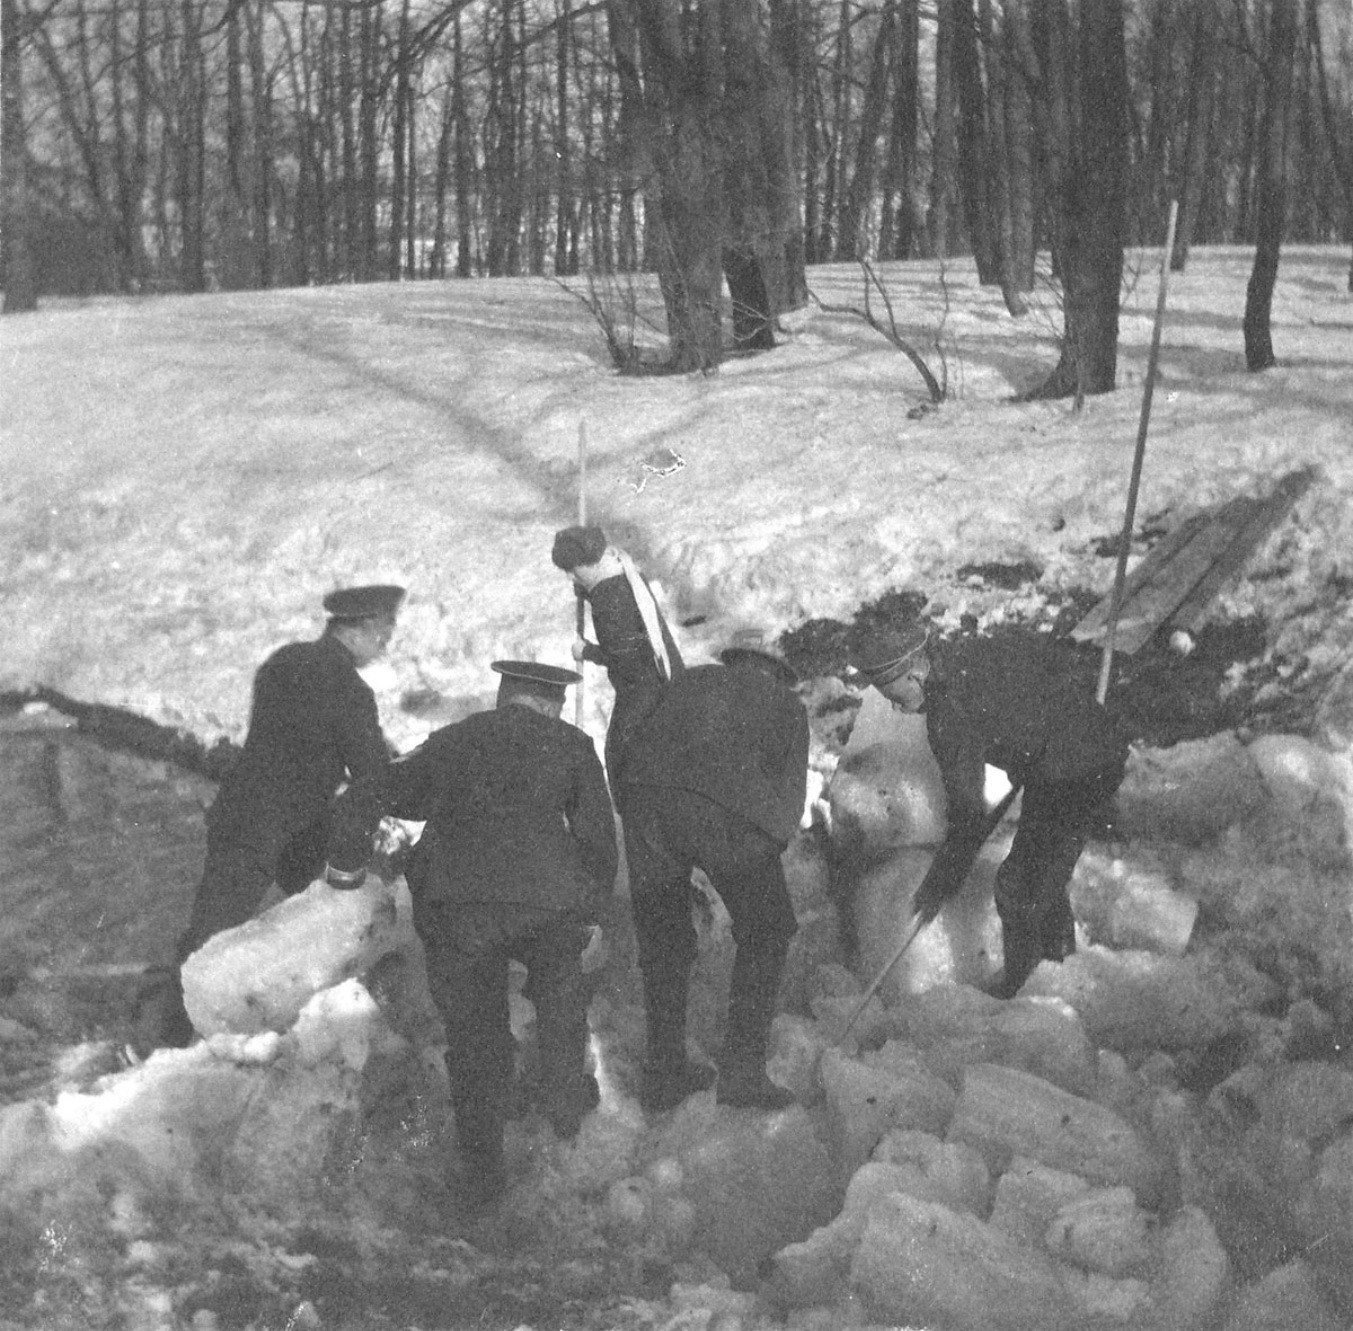 1914. Матросы убирают лёд у плотины пруда